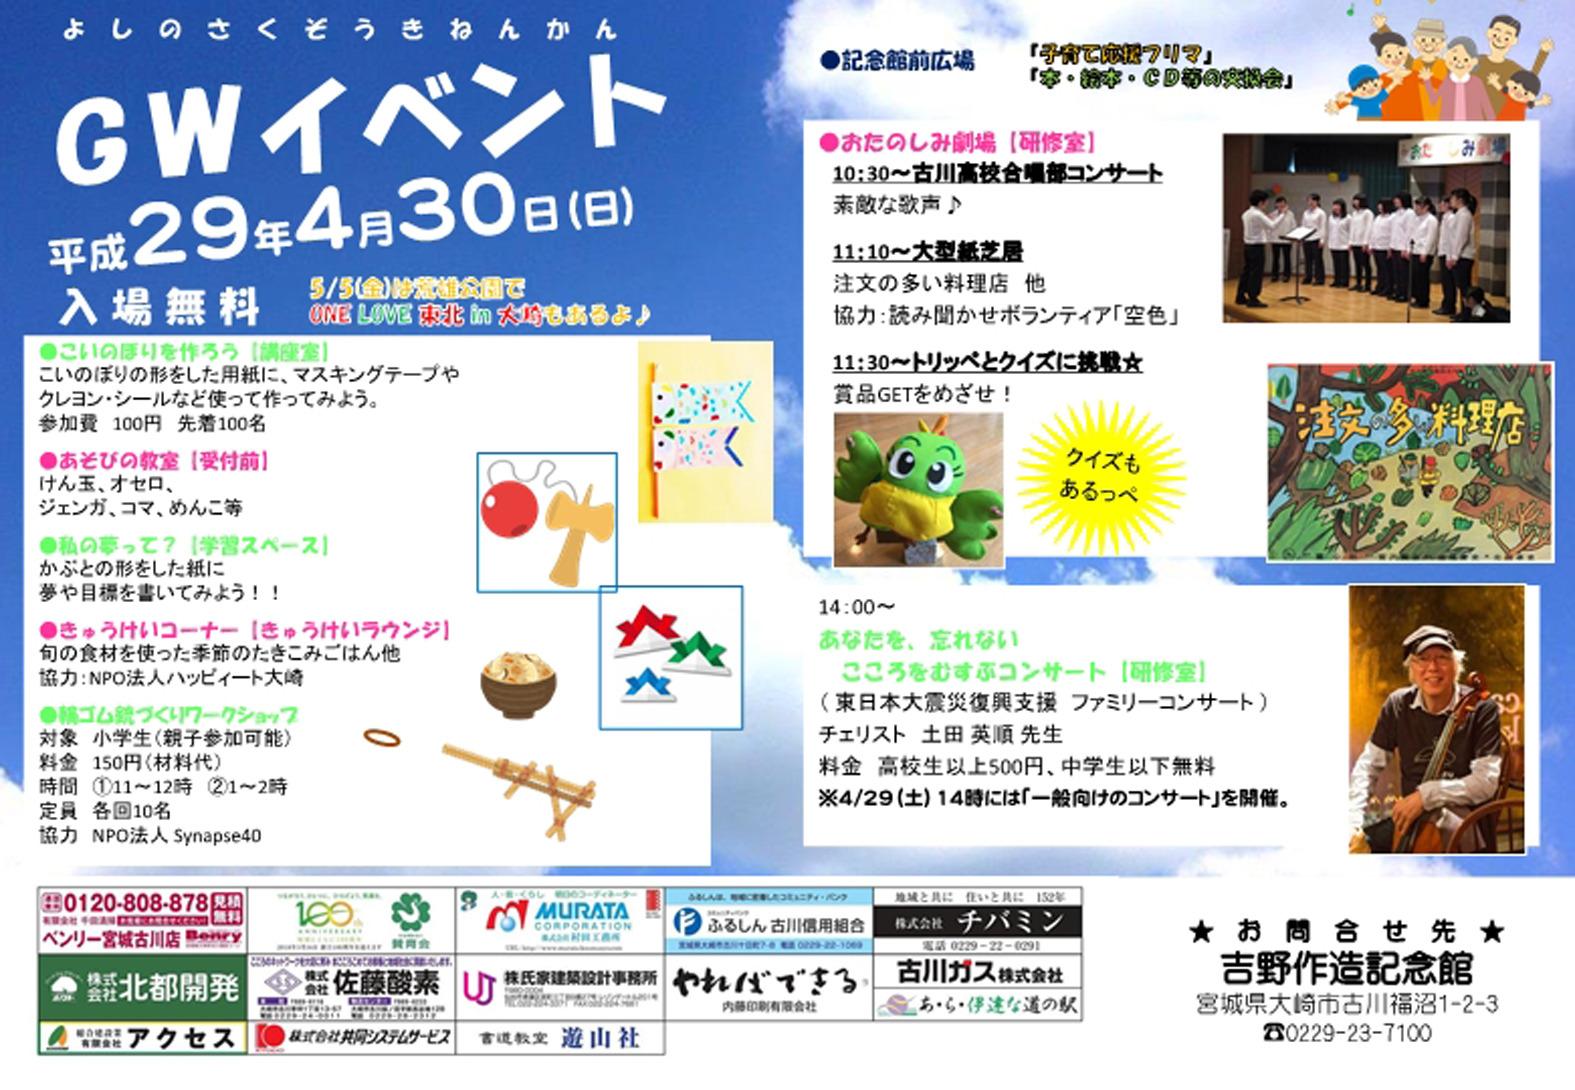 GWイベント 吉野作造記念館